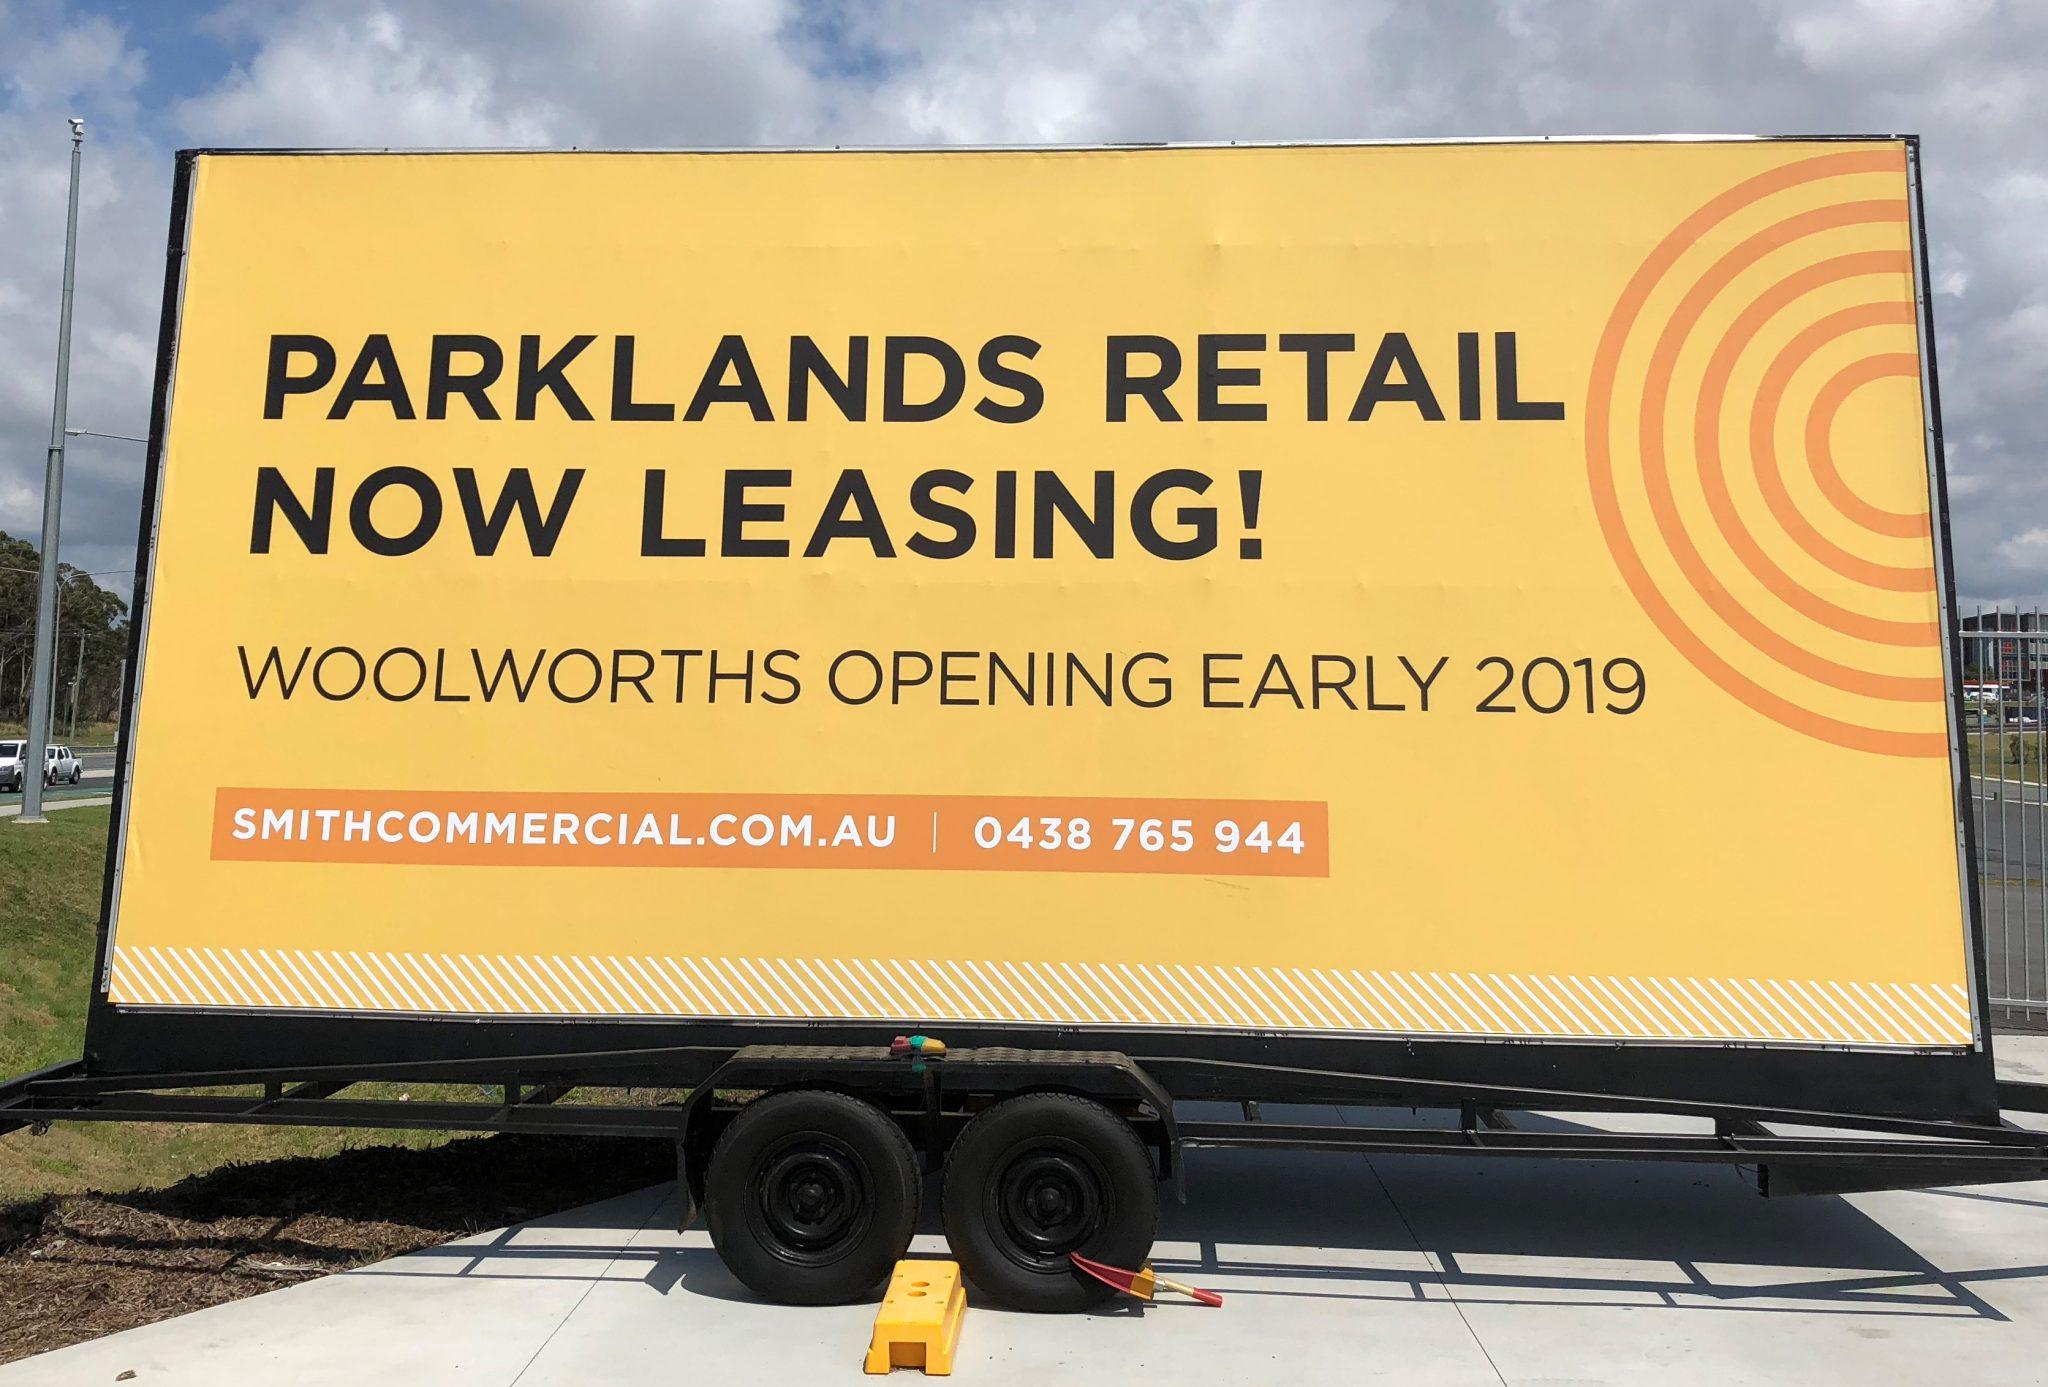 Trailer billboard for Parklands retail space leasing